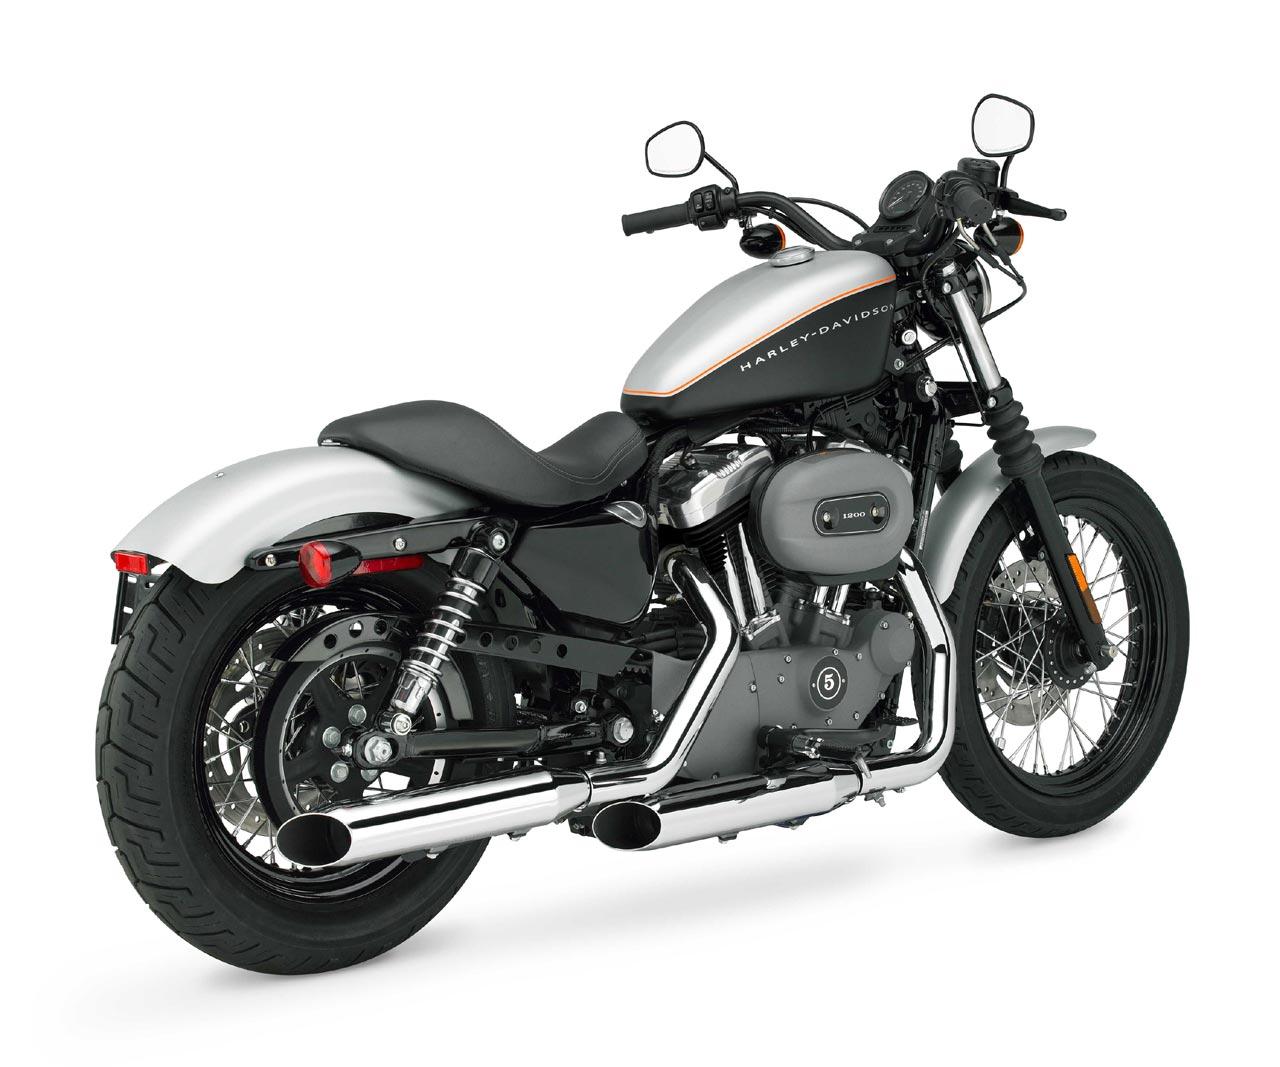 Top Motorcycle Inc: Great Harley Davidson Nightster